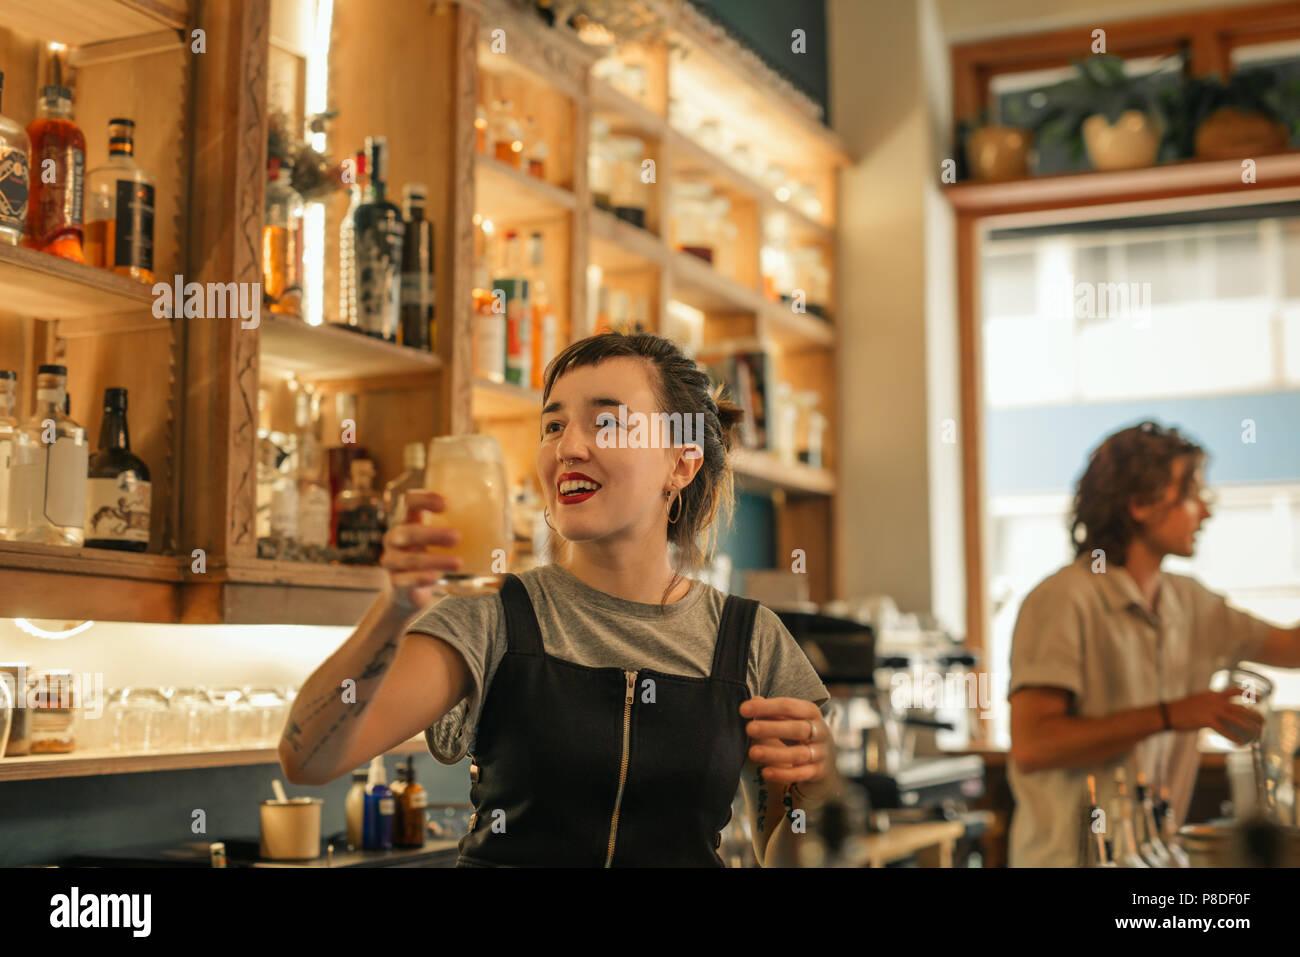 Smiling young female bartender making cocktails dans un bar Photo Stock